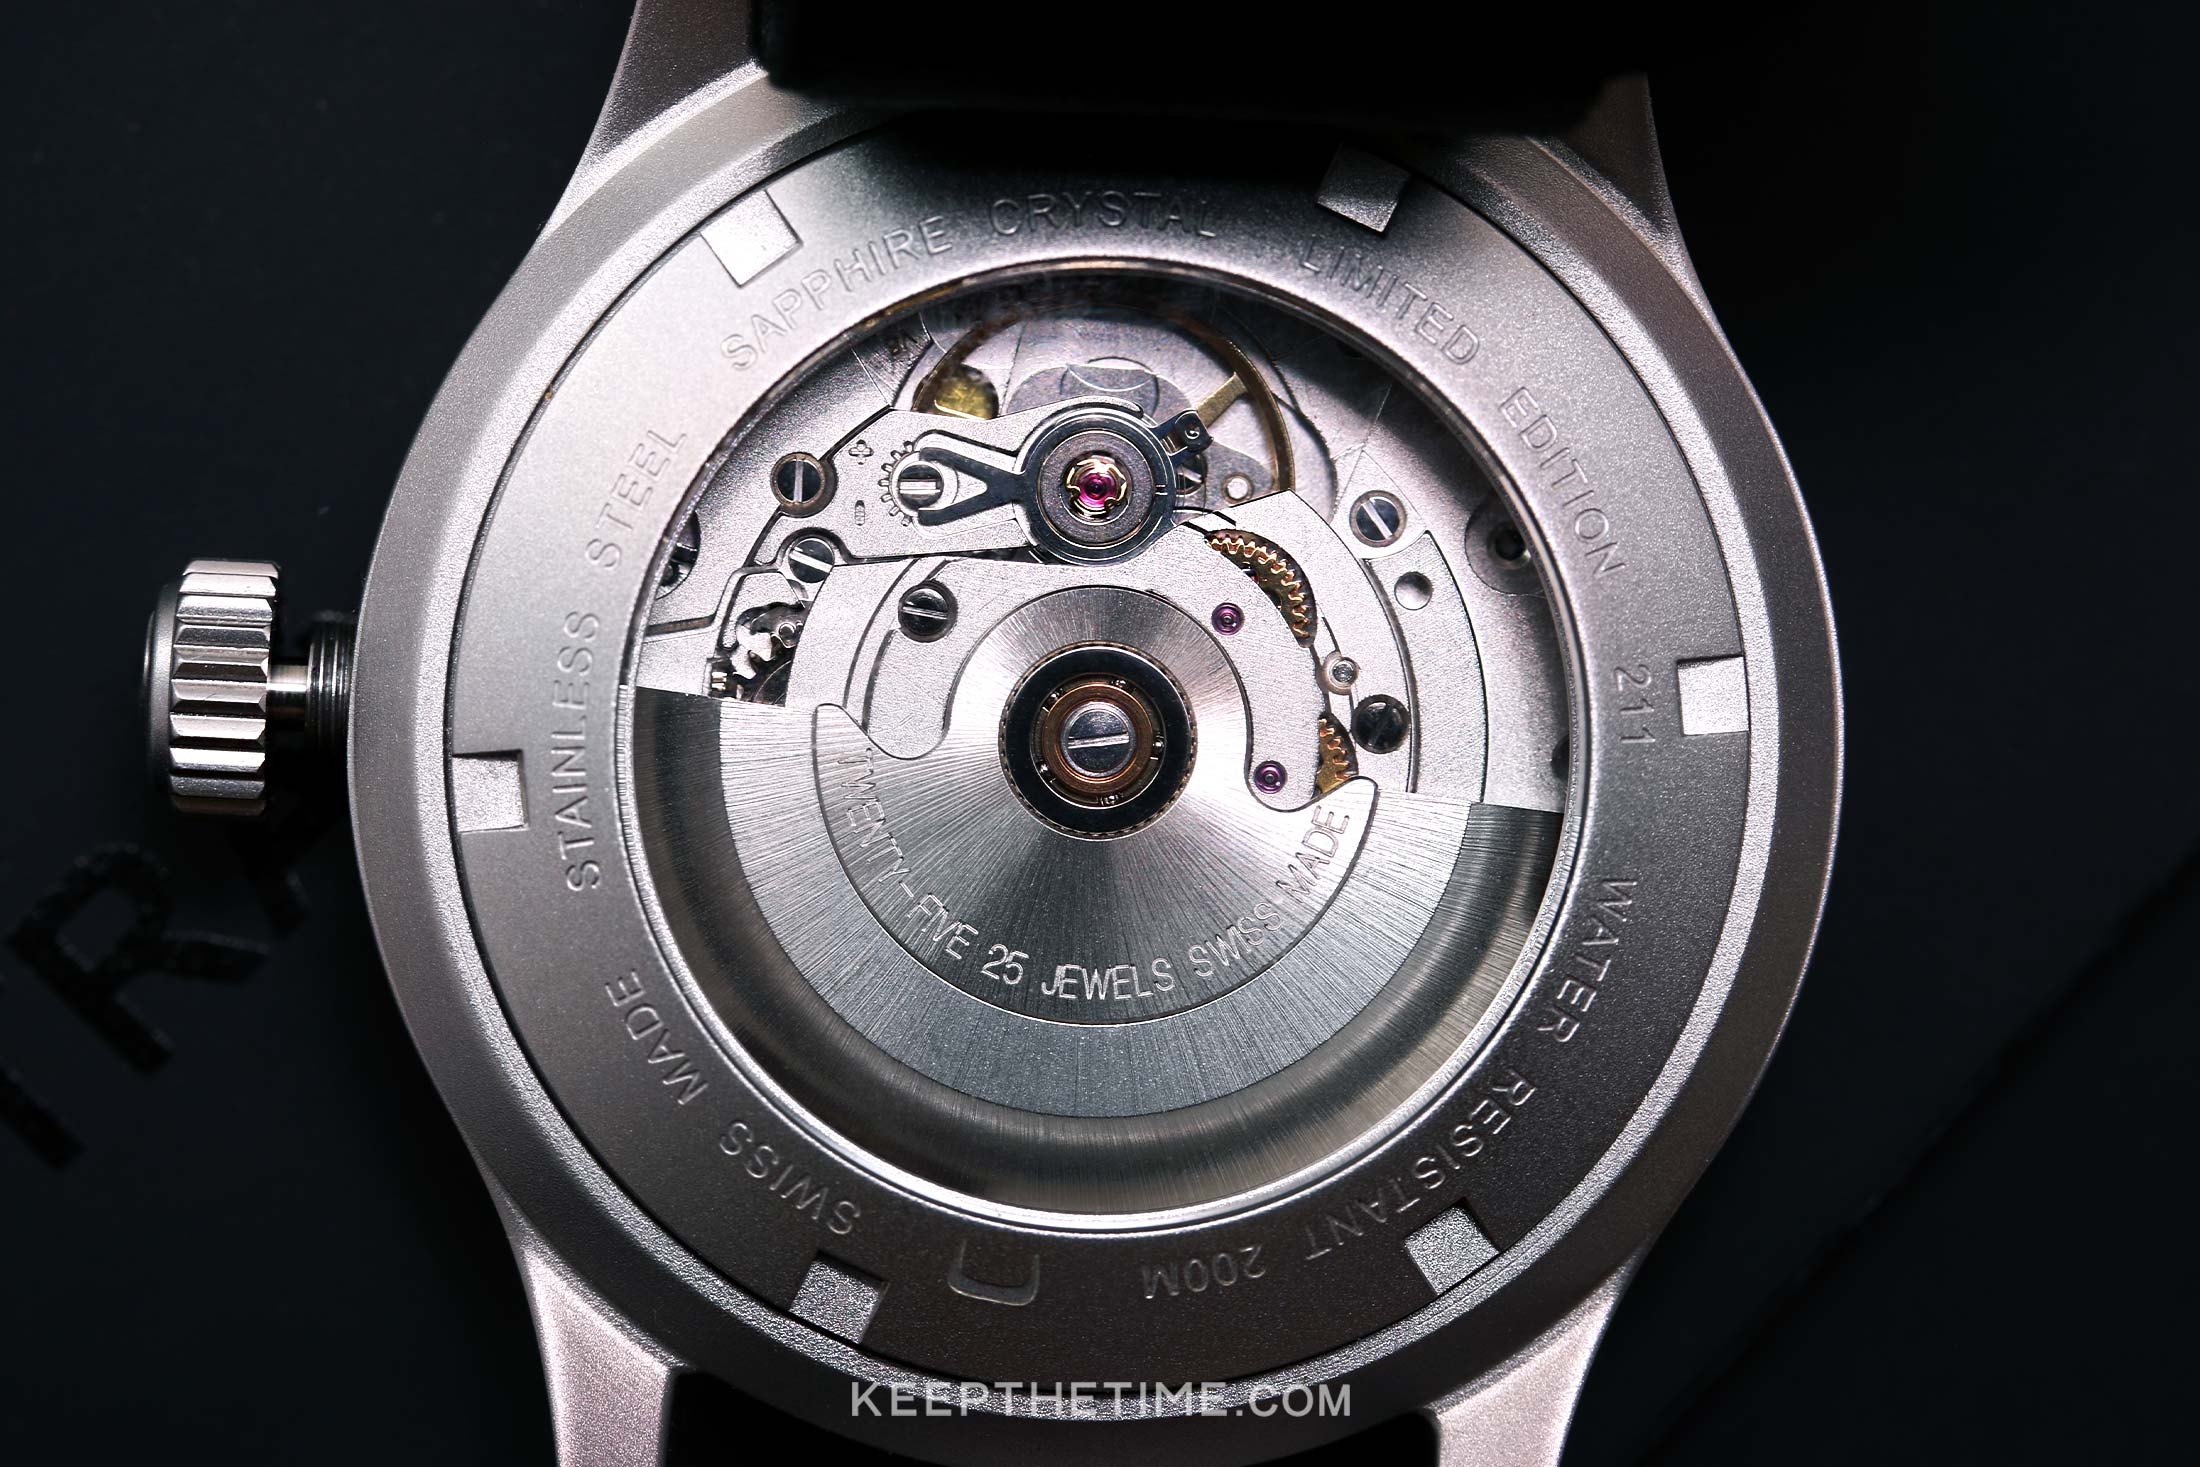 peren-nera-transylvania-micro-watch-2824-2.jpg